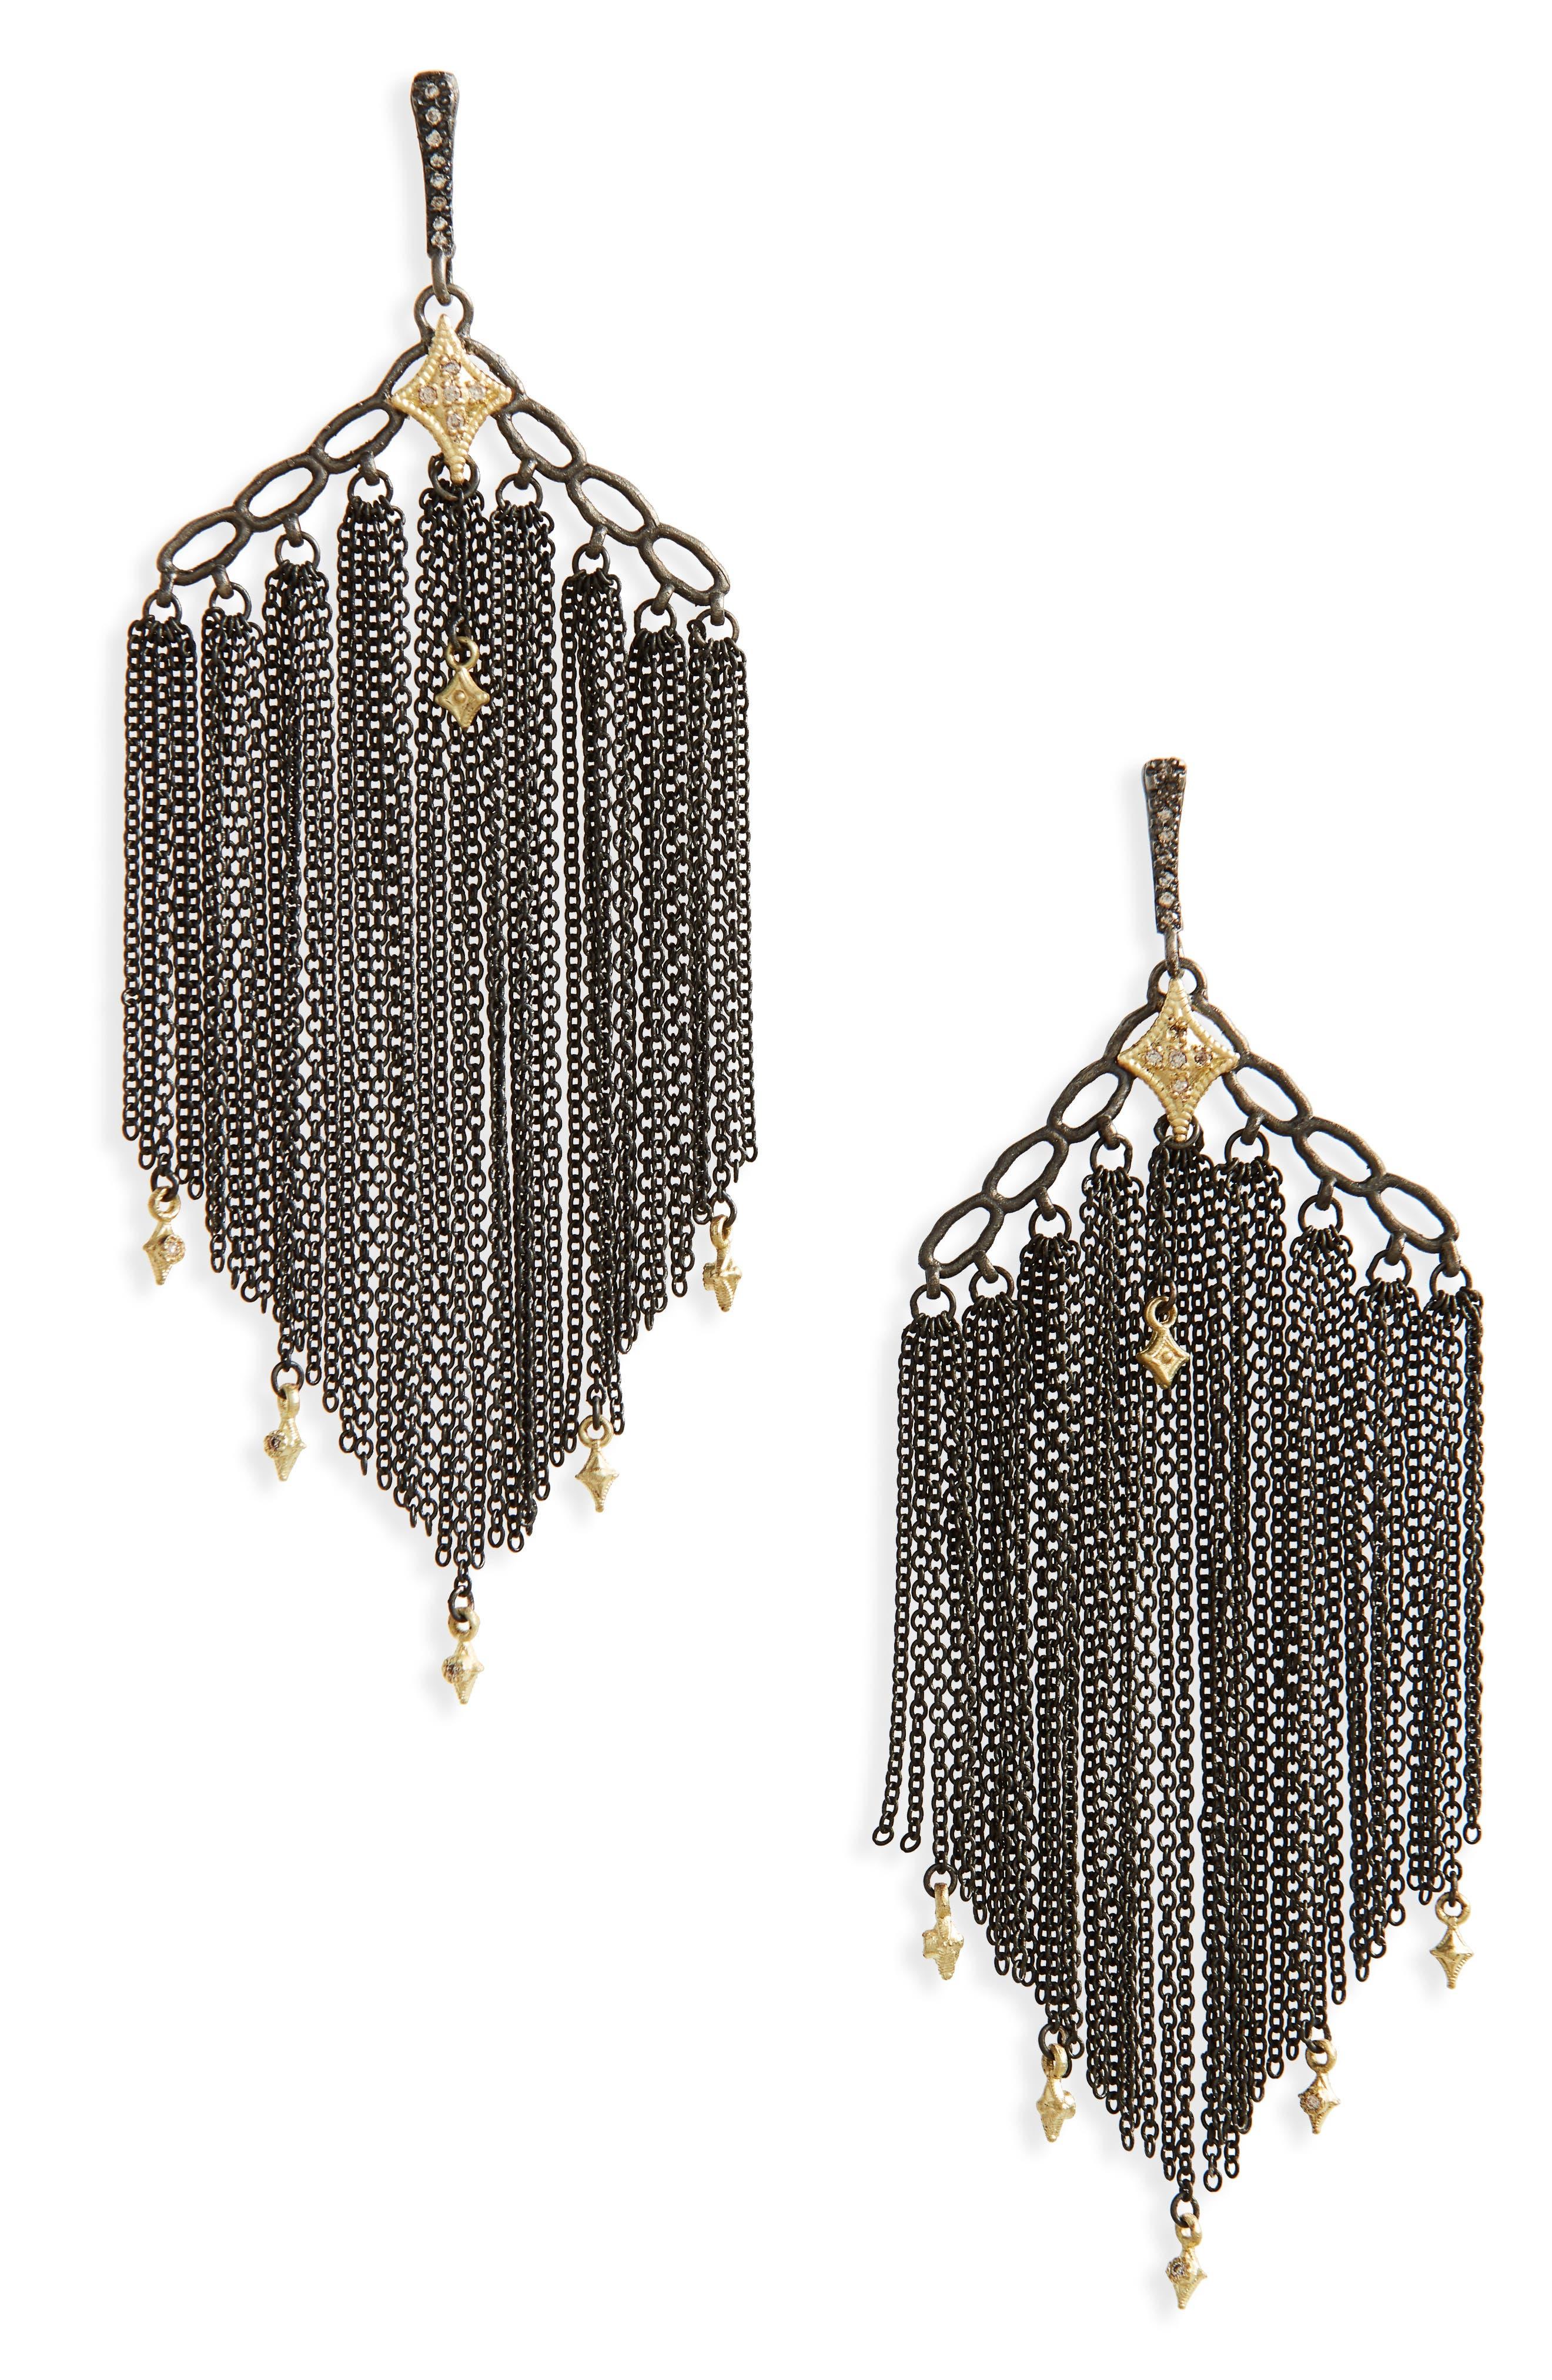 Old World Crivelli Chain Earrings,                             Main thumbnail 1, color,                             BLACKENED SILVER/ DIAMONDS